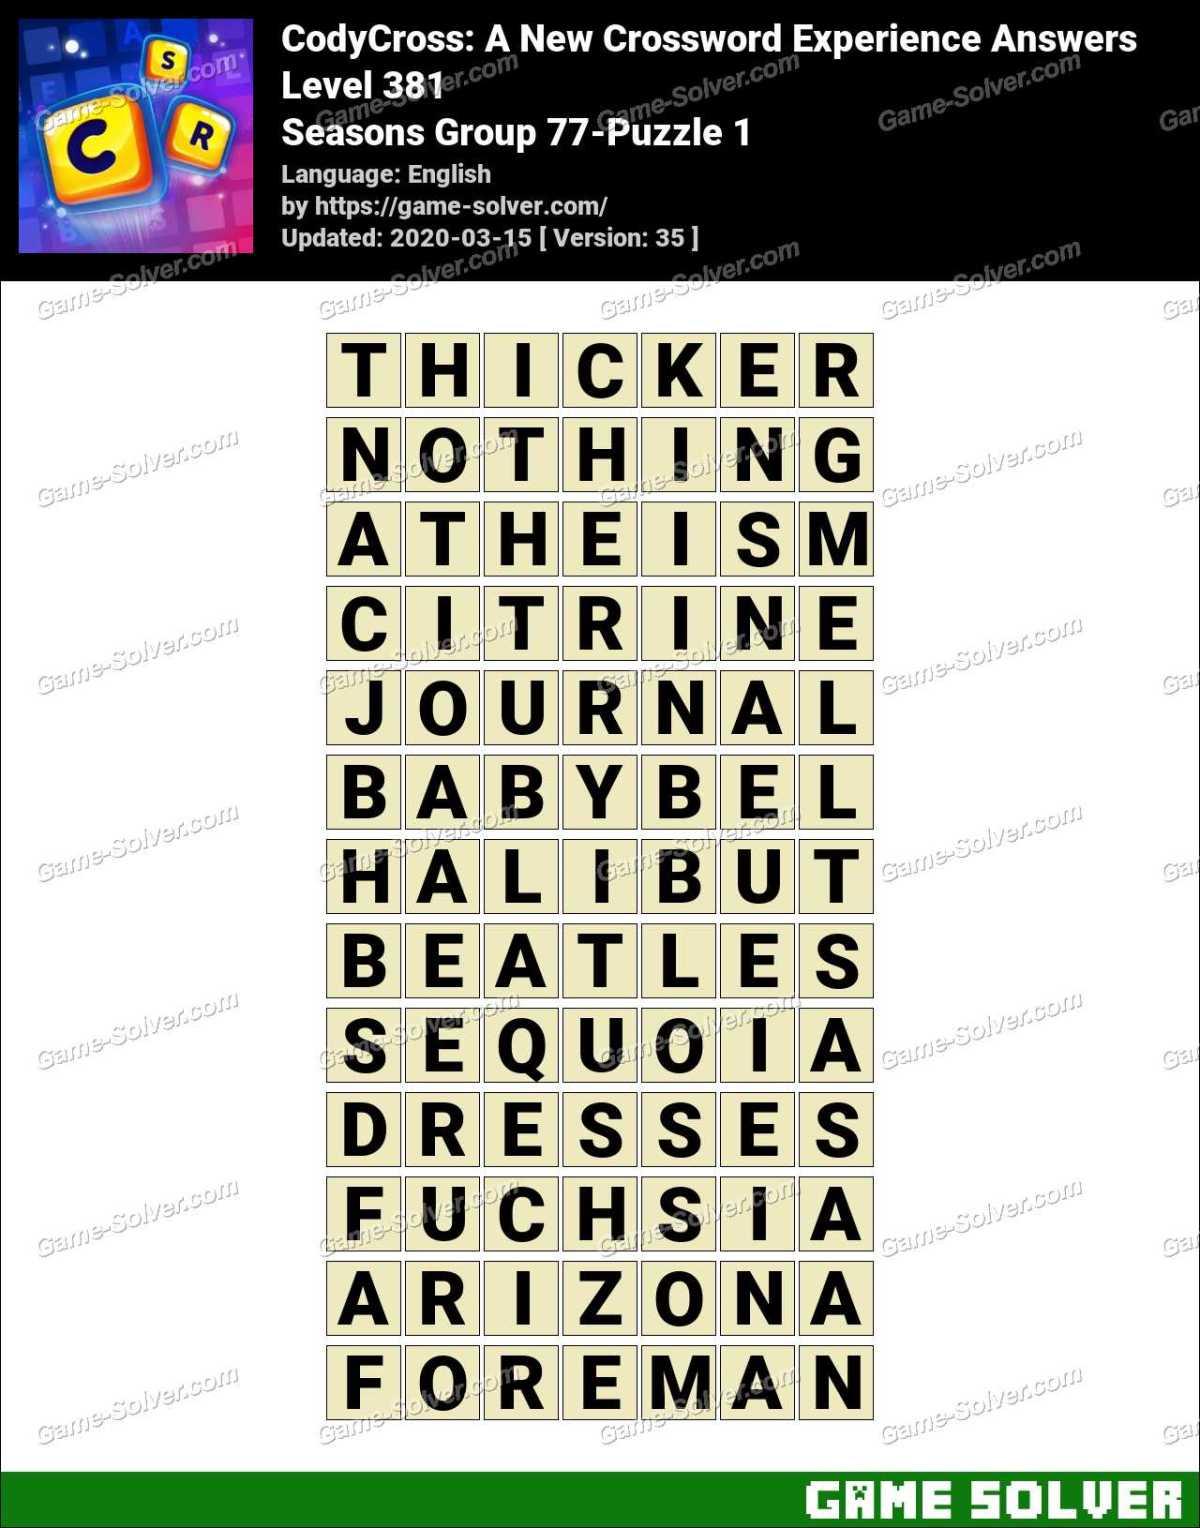 CodyCross Seasons Group 77-Puzzle 1 Answers